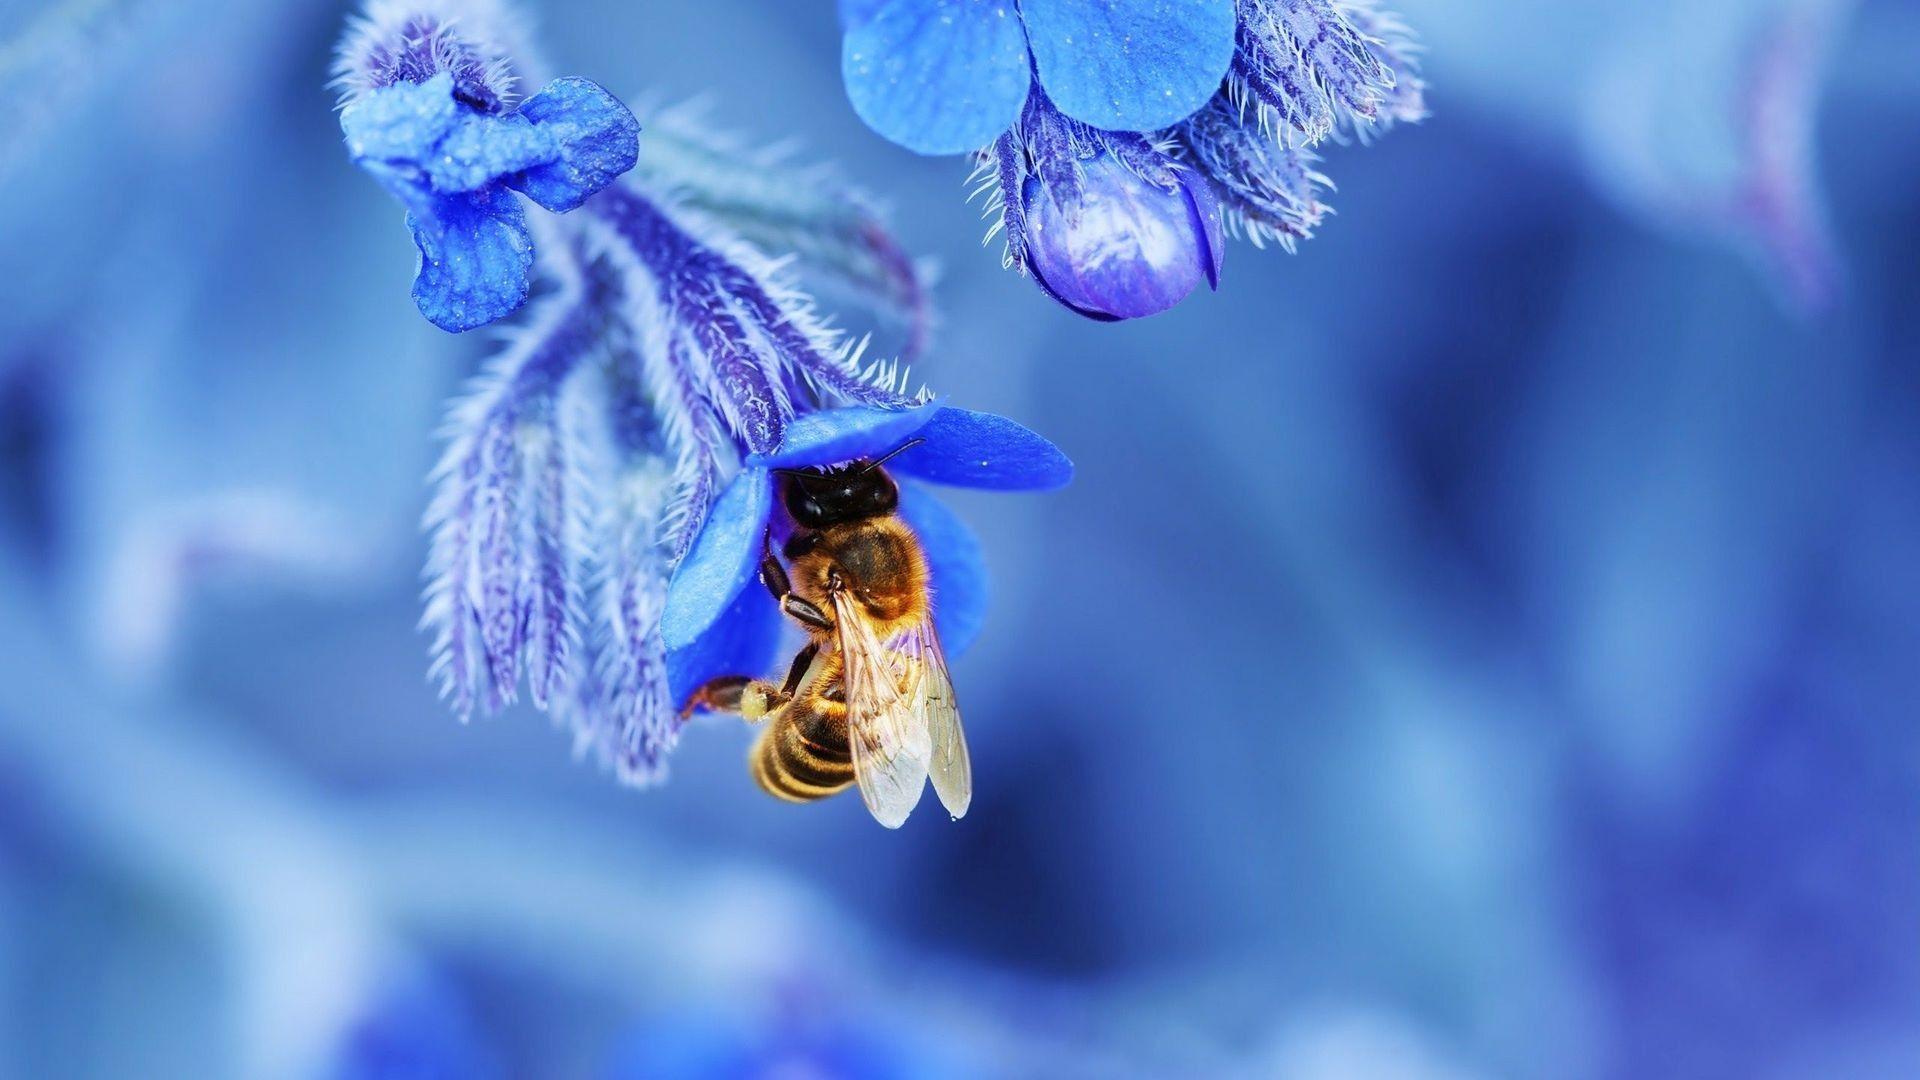 Free Images blossom flower purple pollen spring herb